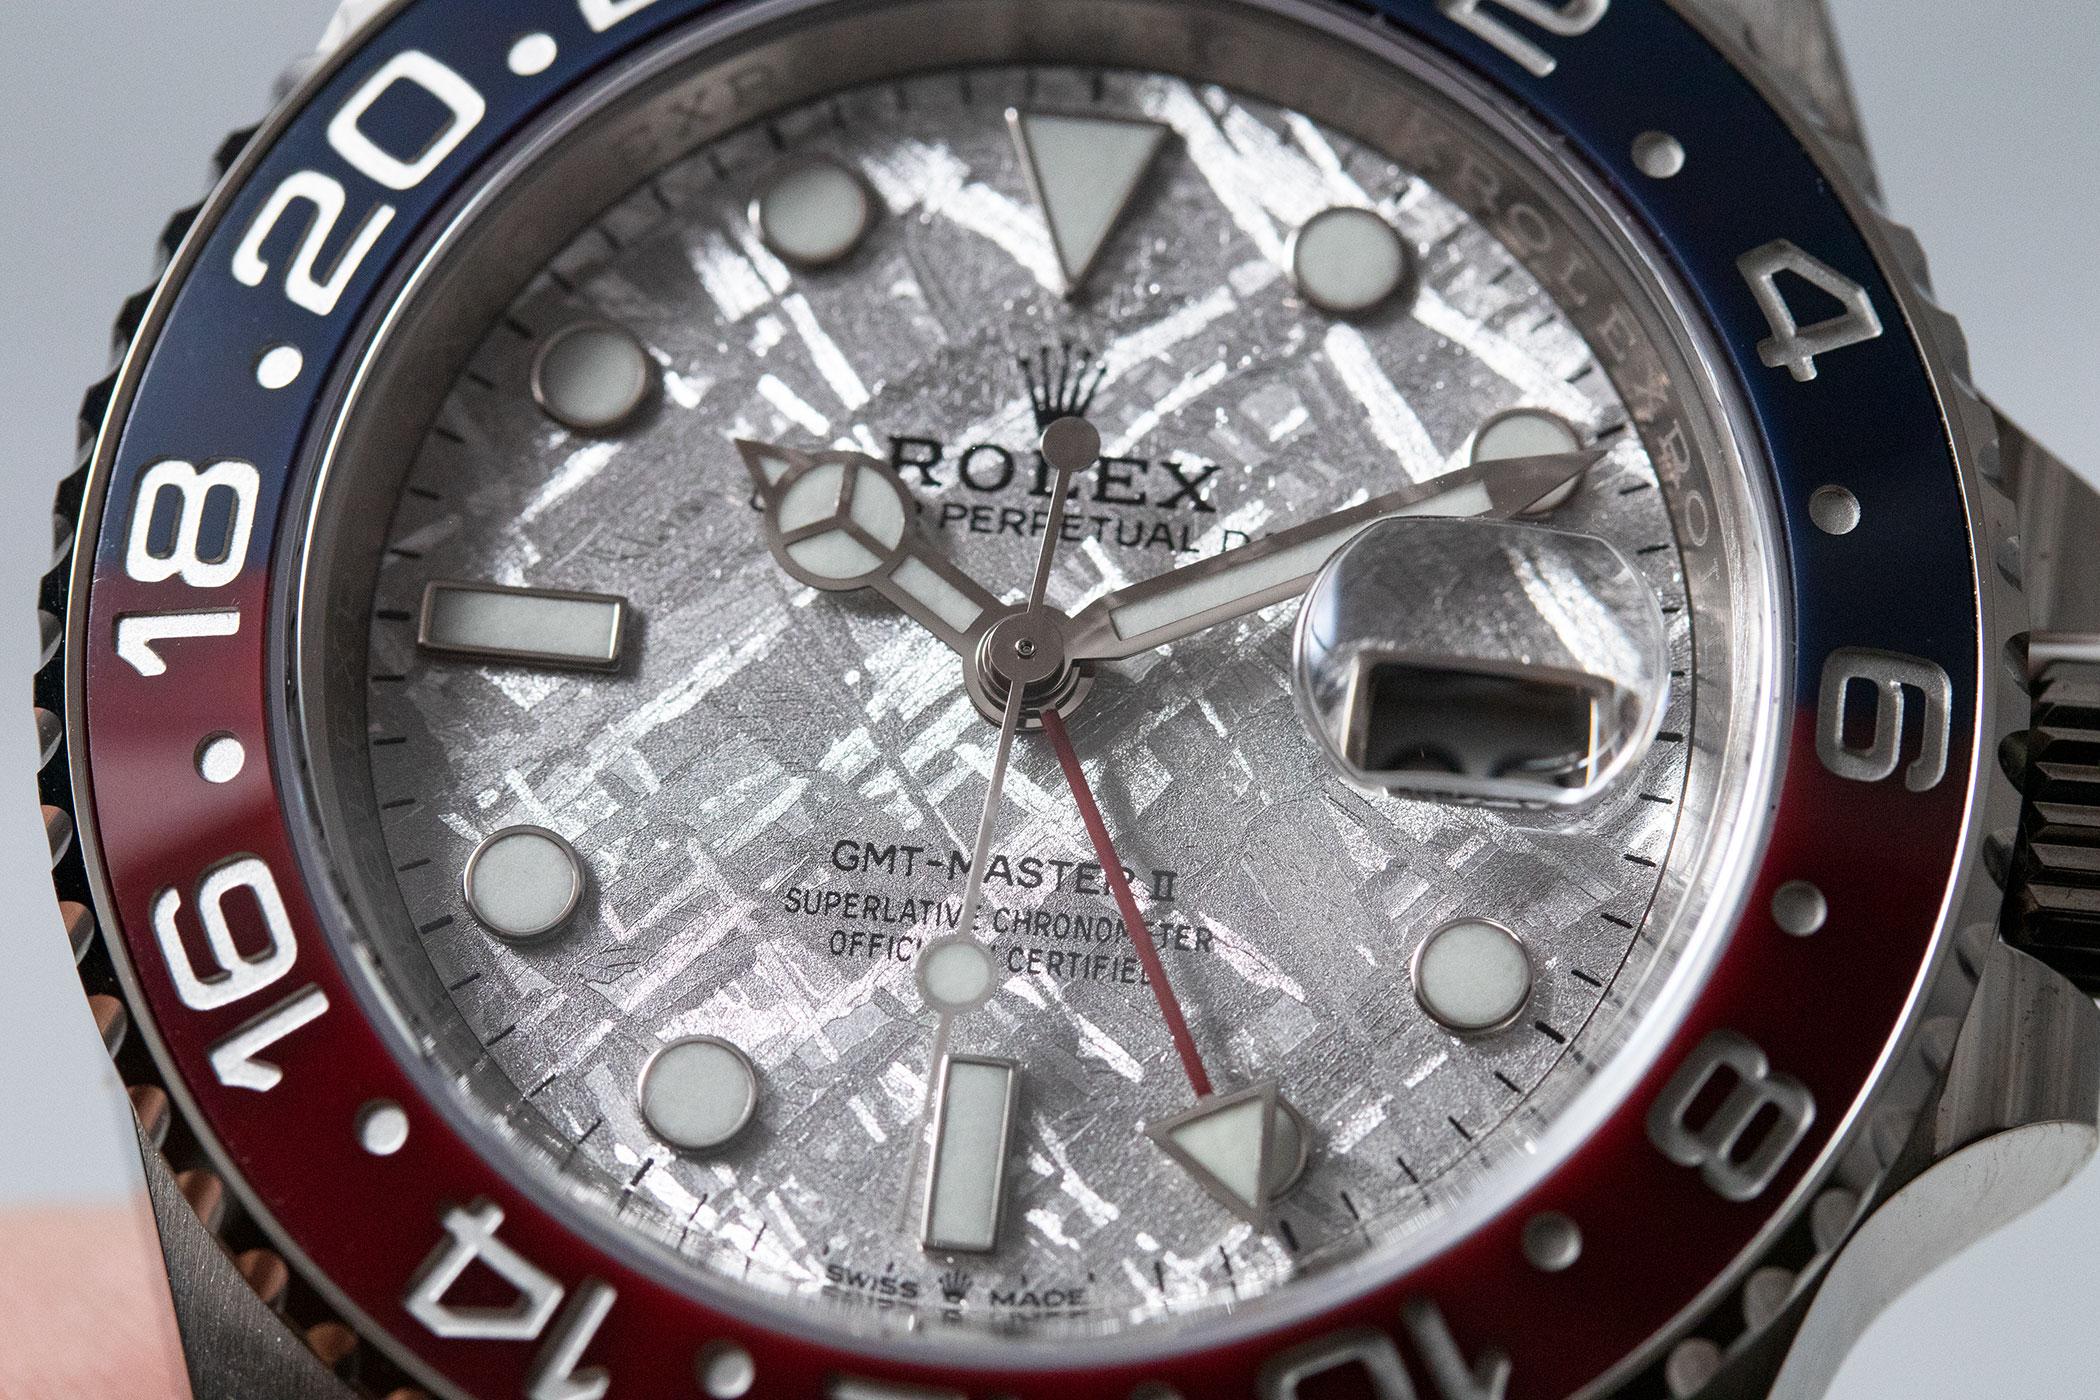 Rolex GMT-Master II 126719BLRO White Gold Pepsi Meteorite